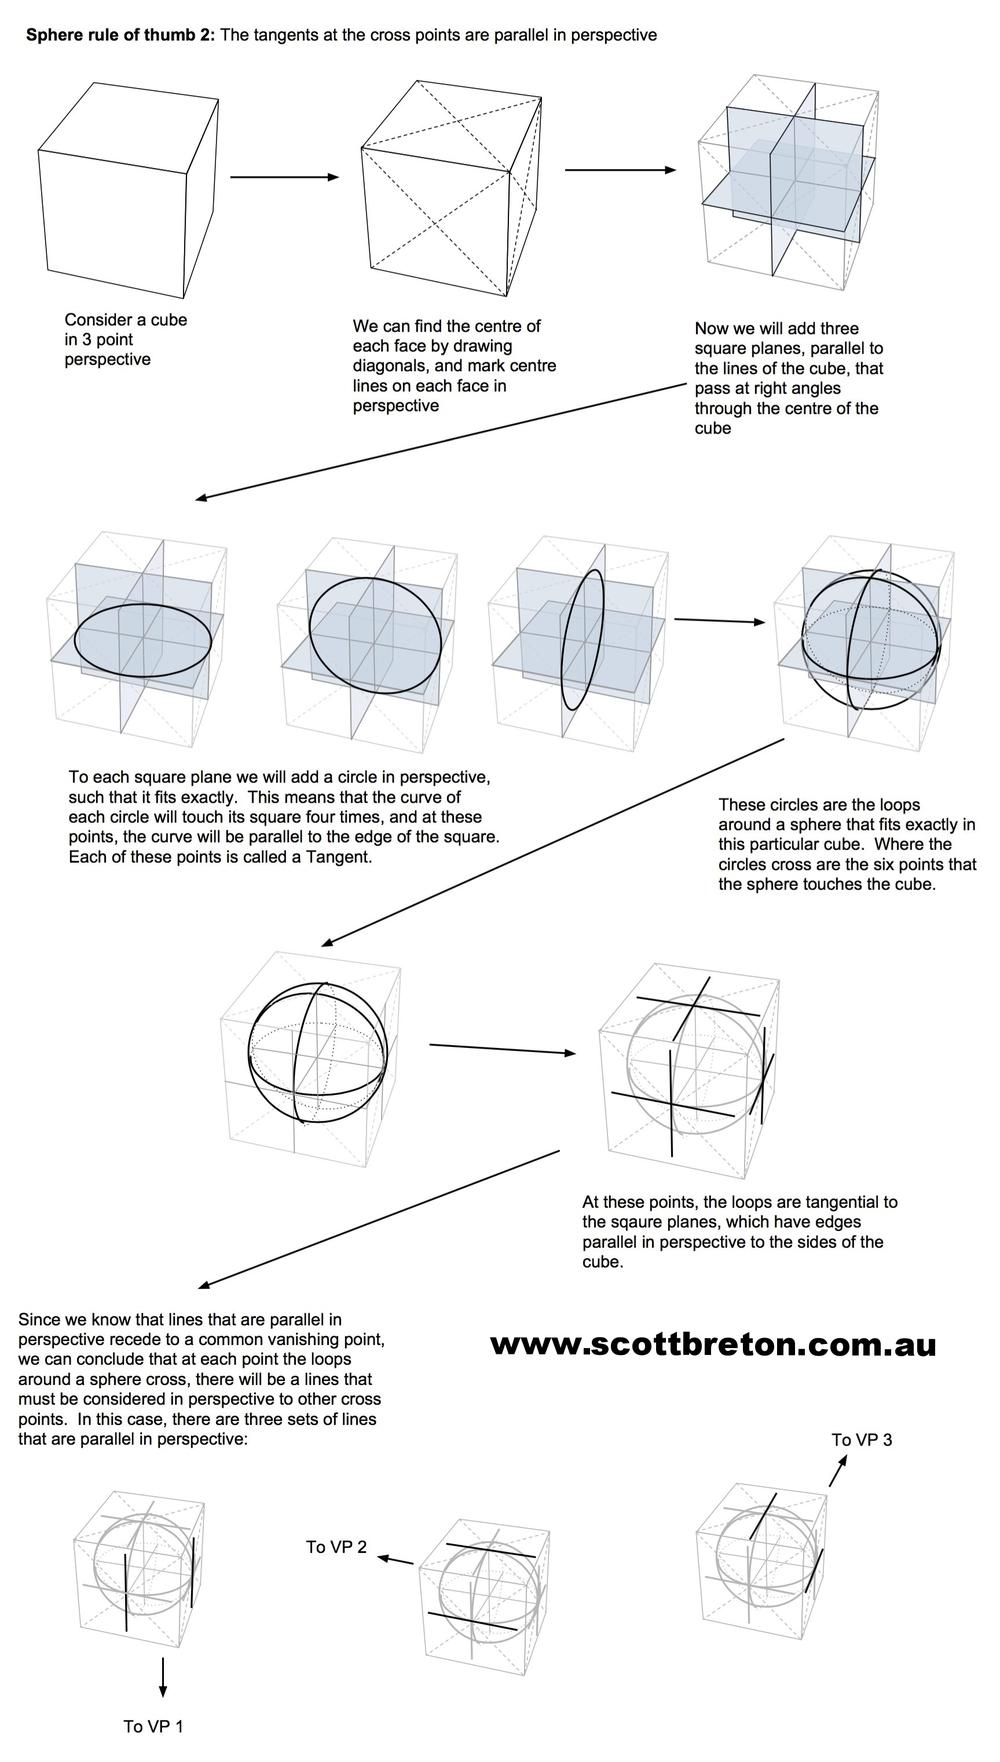 Scott Breton Sphere 2a.jpg